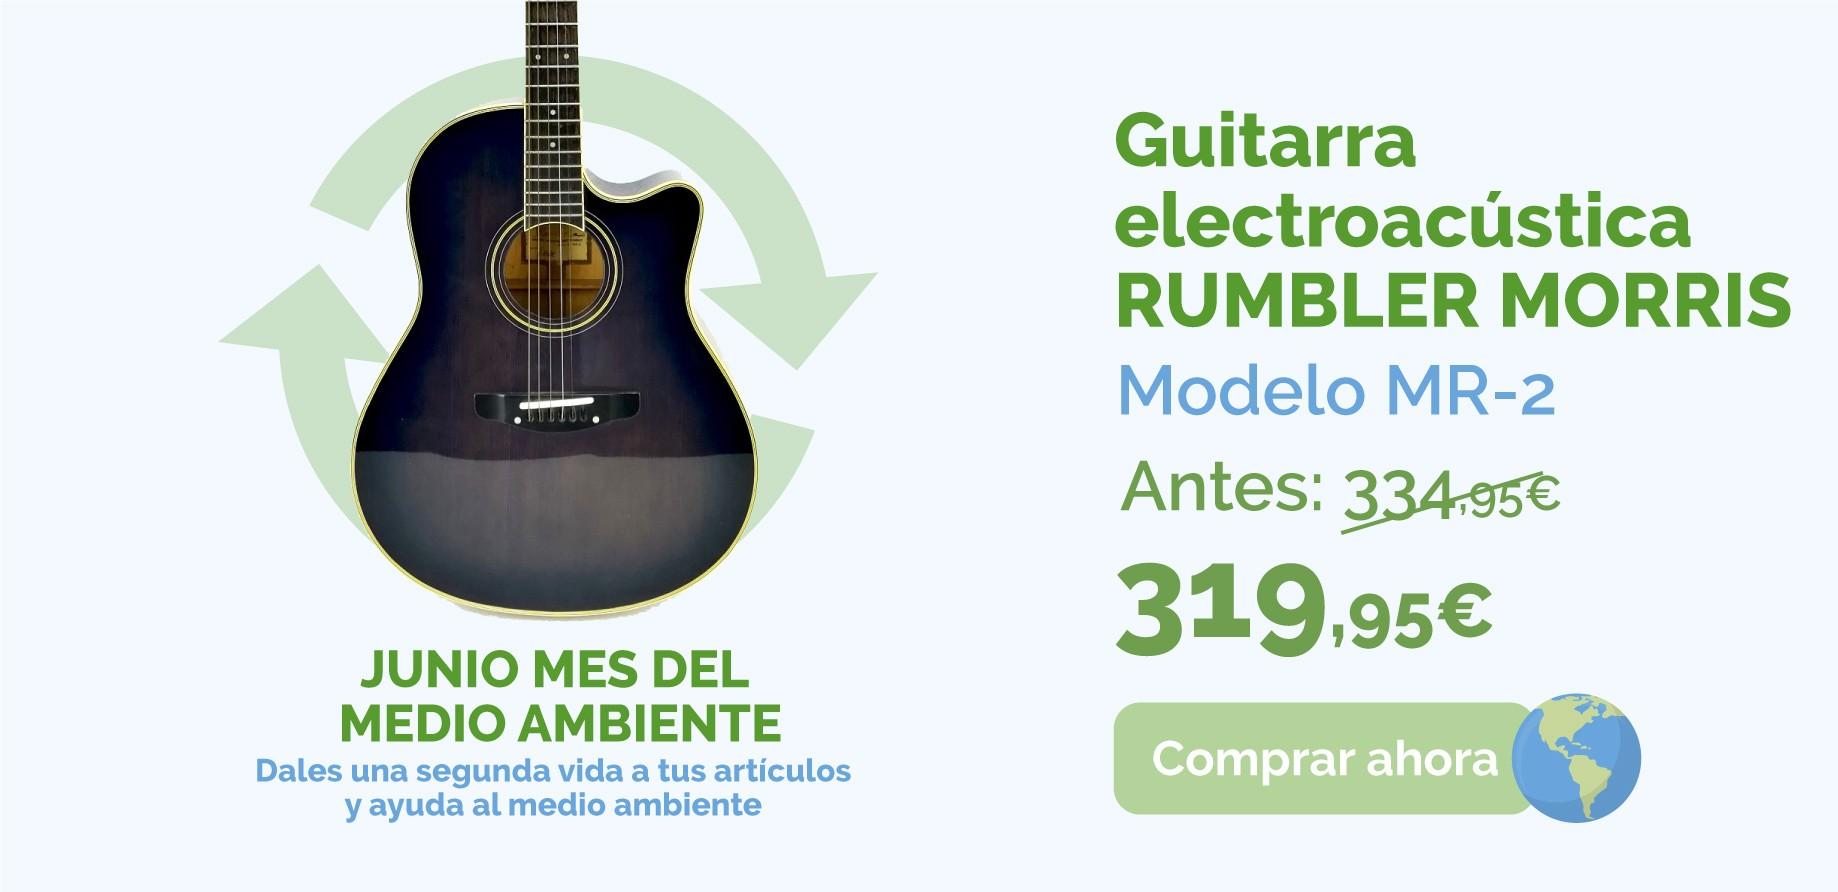 GUITARRA ELECTROACUSTICA RUMBLER MORRIS MOD MR-2 de segunda mano